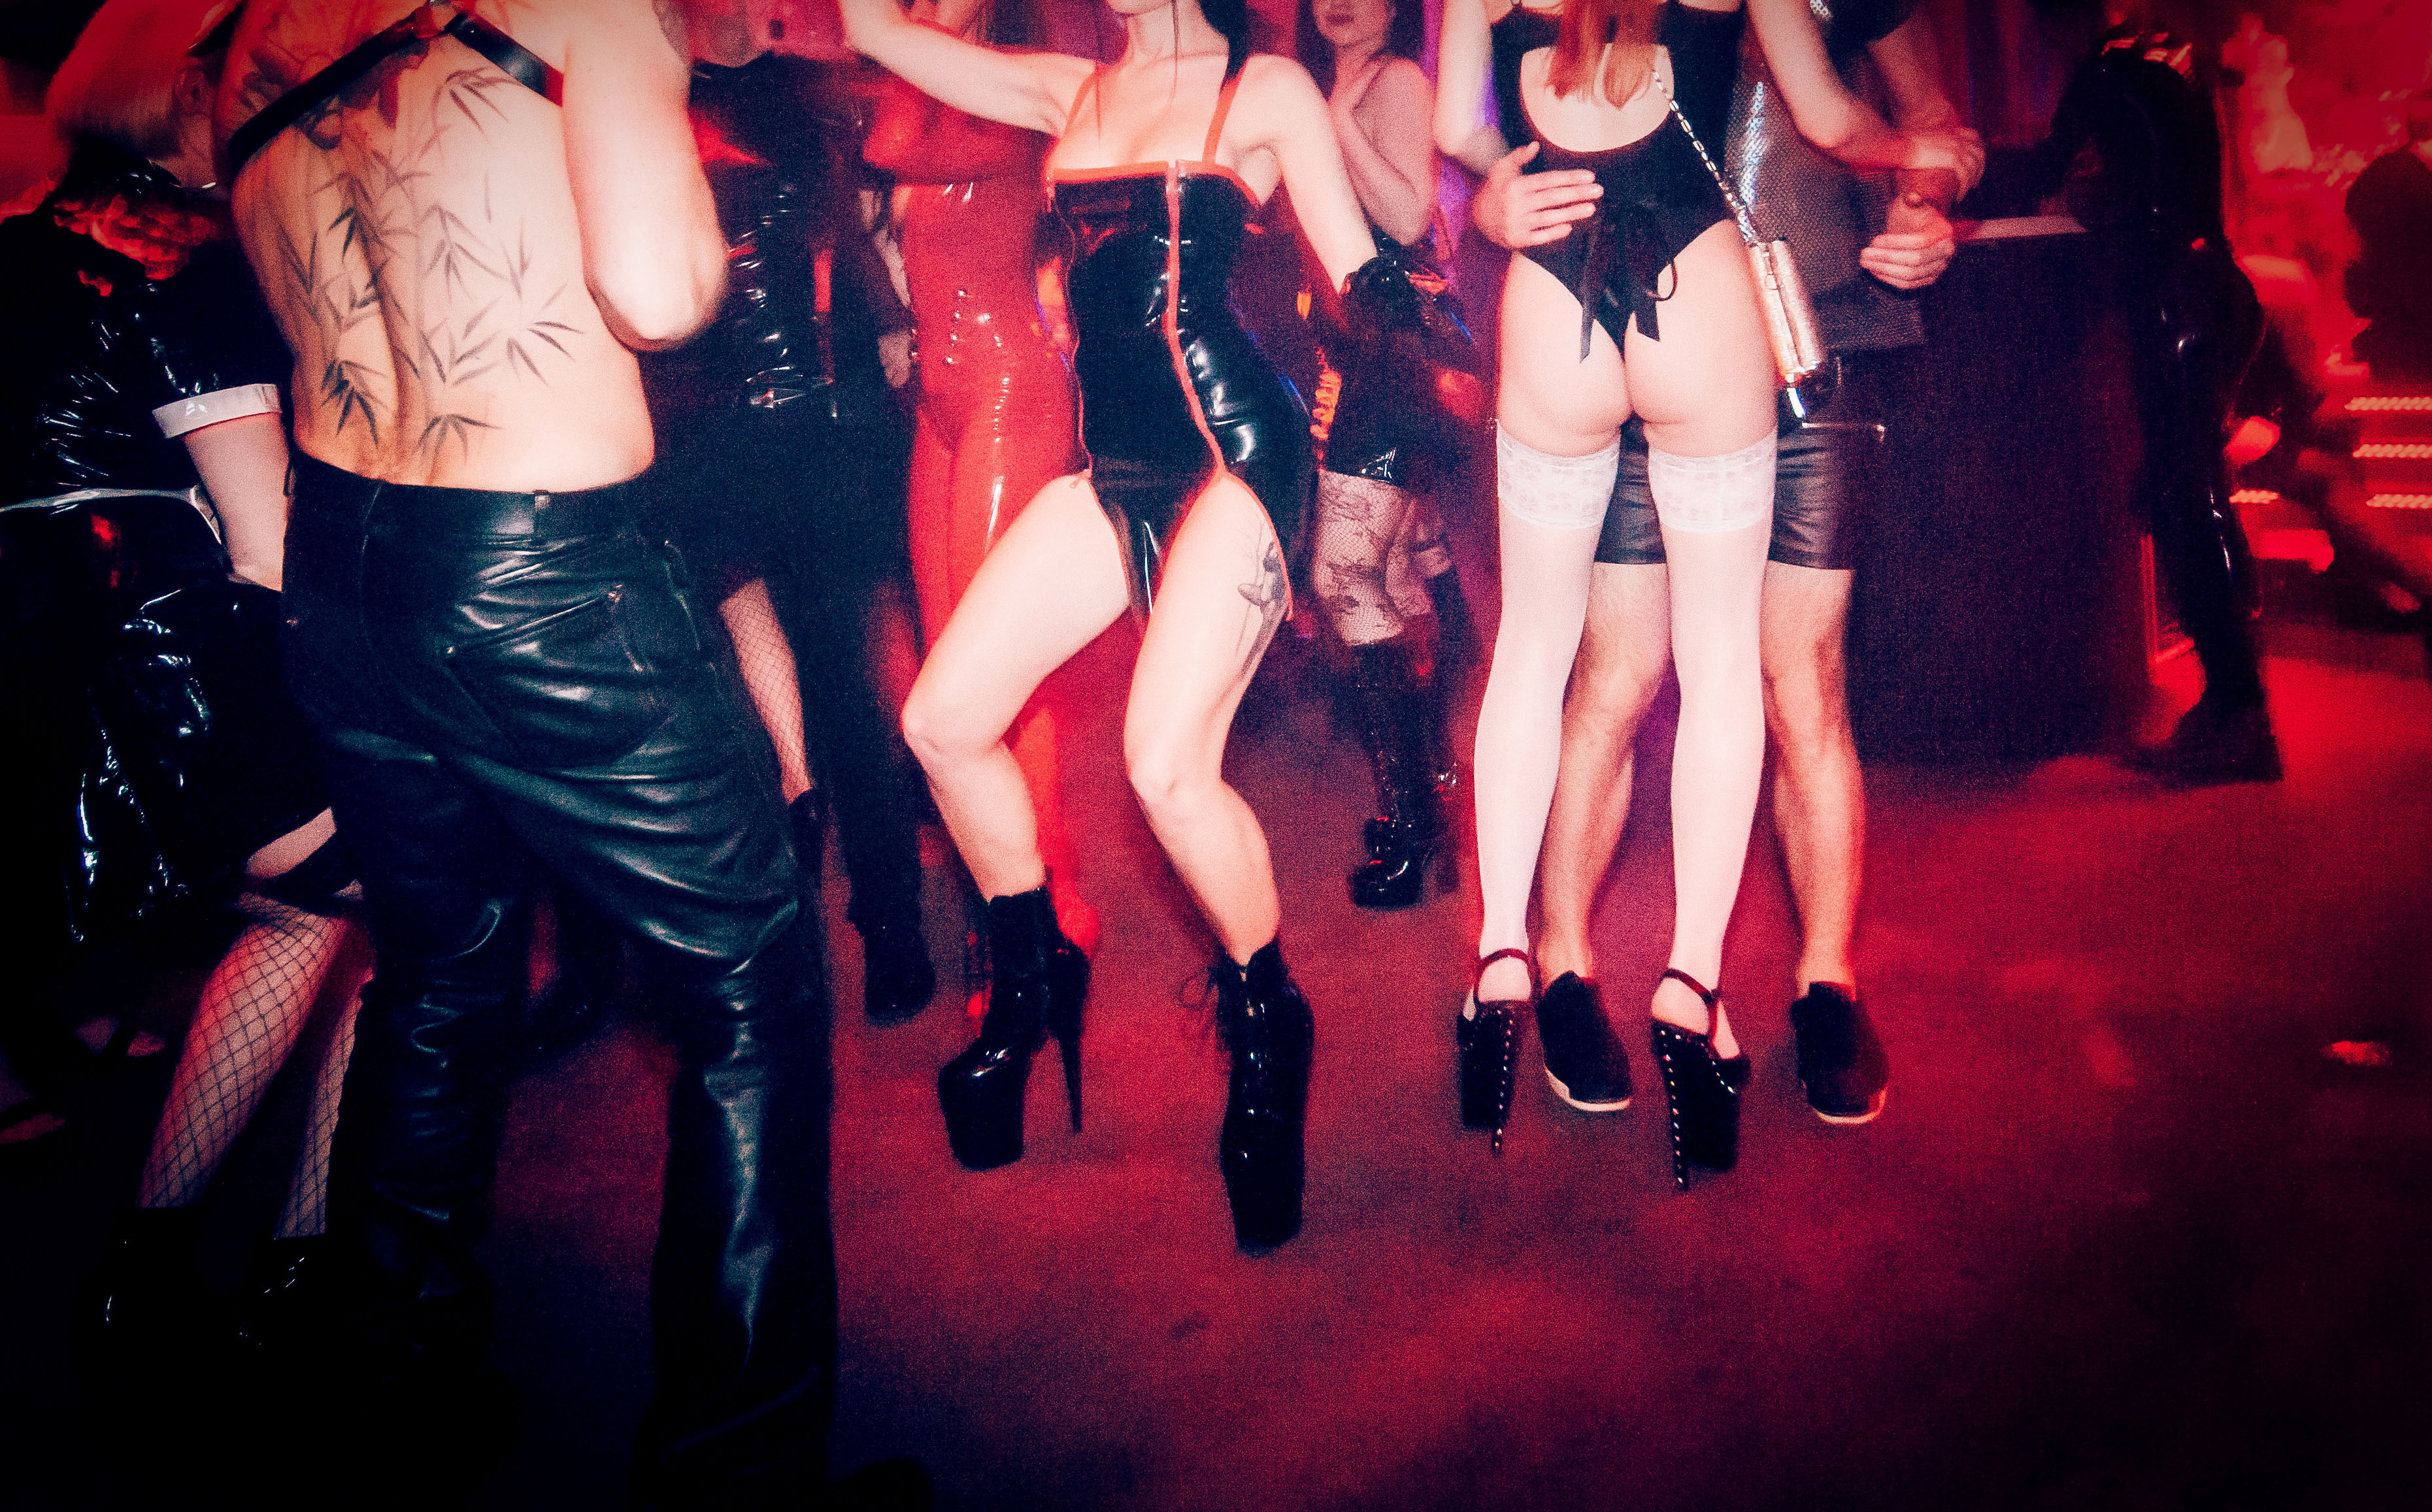 grupa fetysz porno darmowe porno tabu hentai